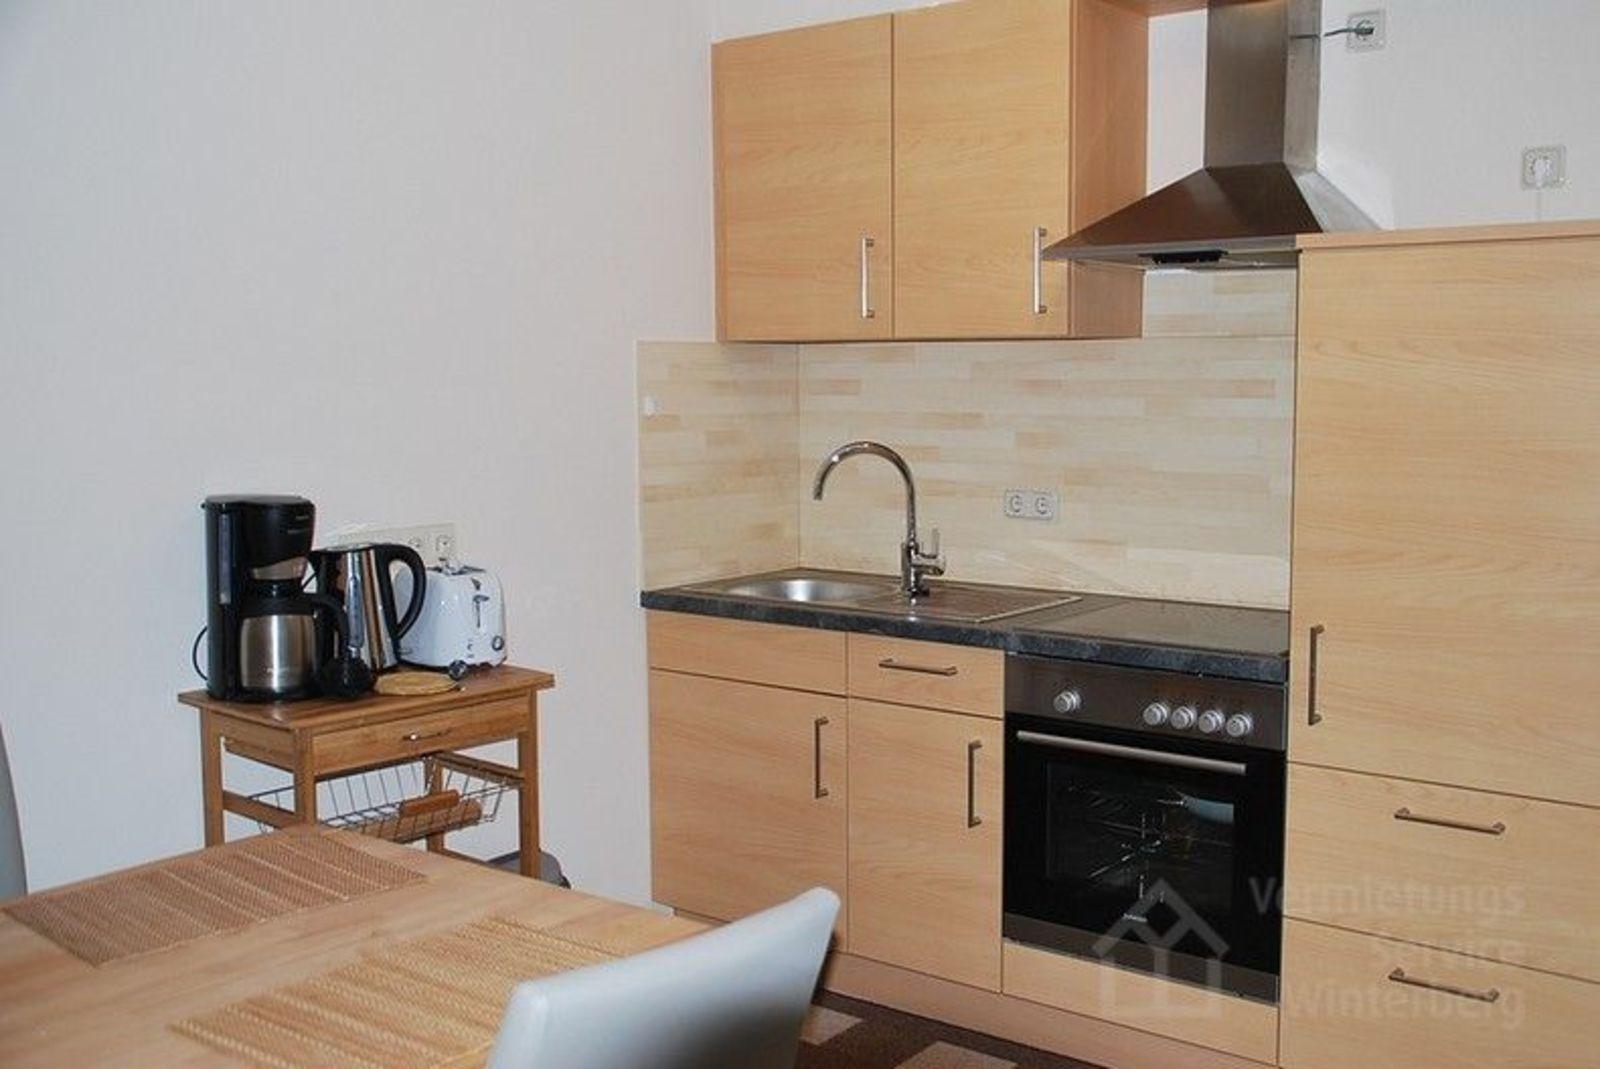 Appartement - Feldstraße 40-C